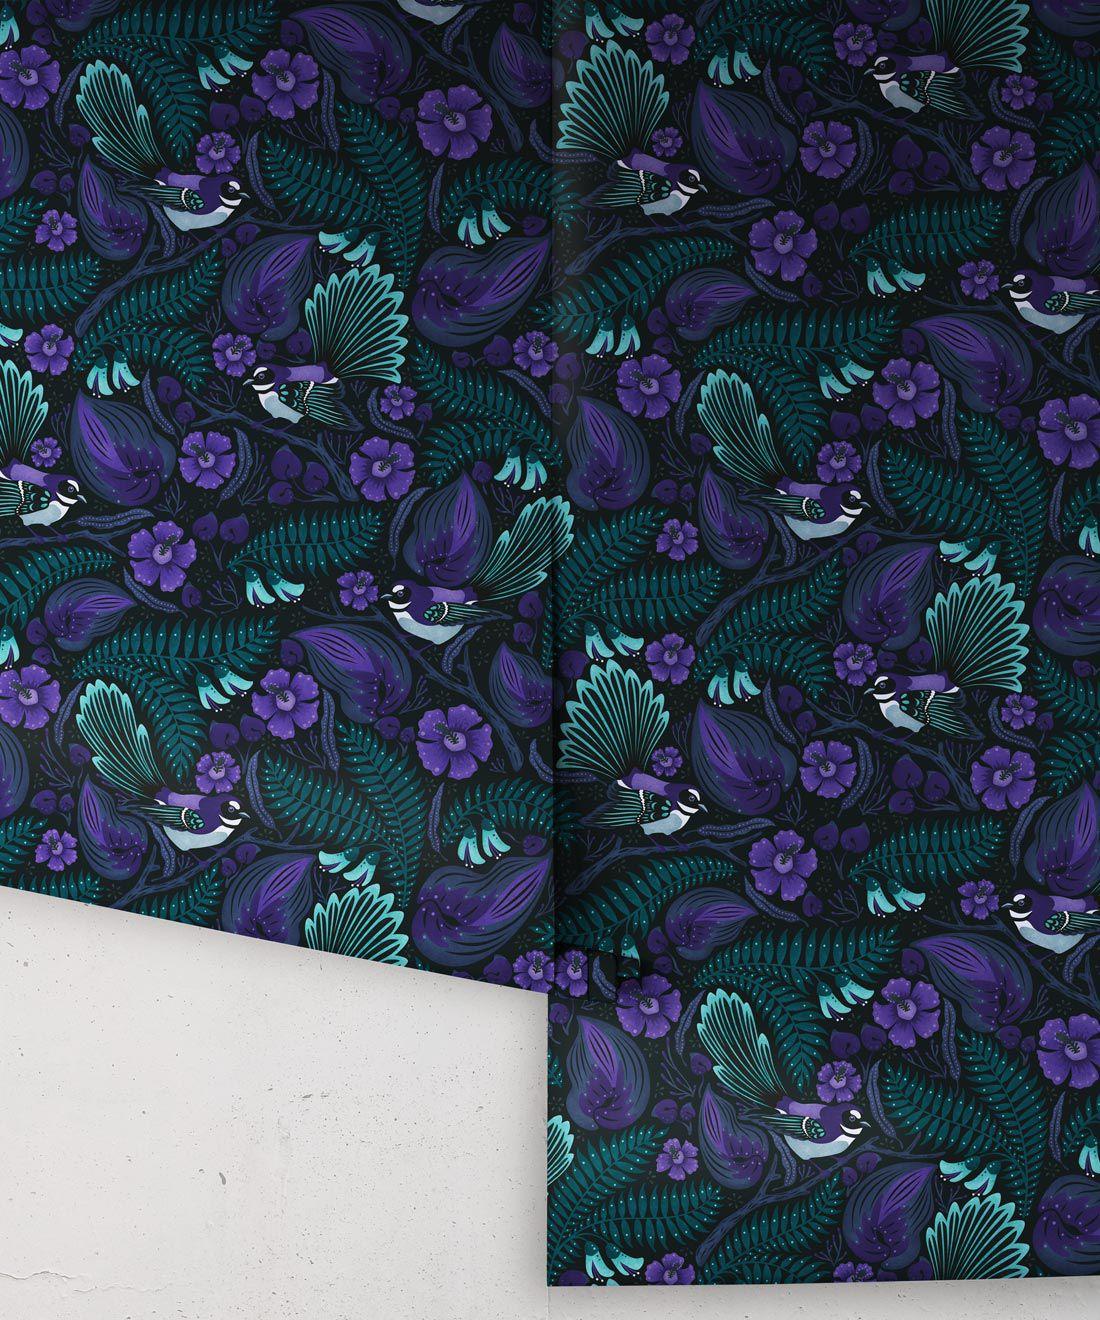 Faintails Wallpaper • New Zealand • Bird Wallpaper • Kowhai Tree • Kowhai Flowers • Dark Purple Blue Wallpaper • Midnight Colorway • Wallpaper Rolls